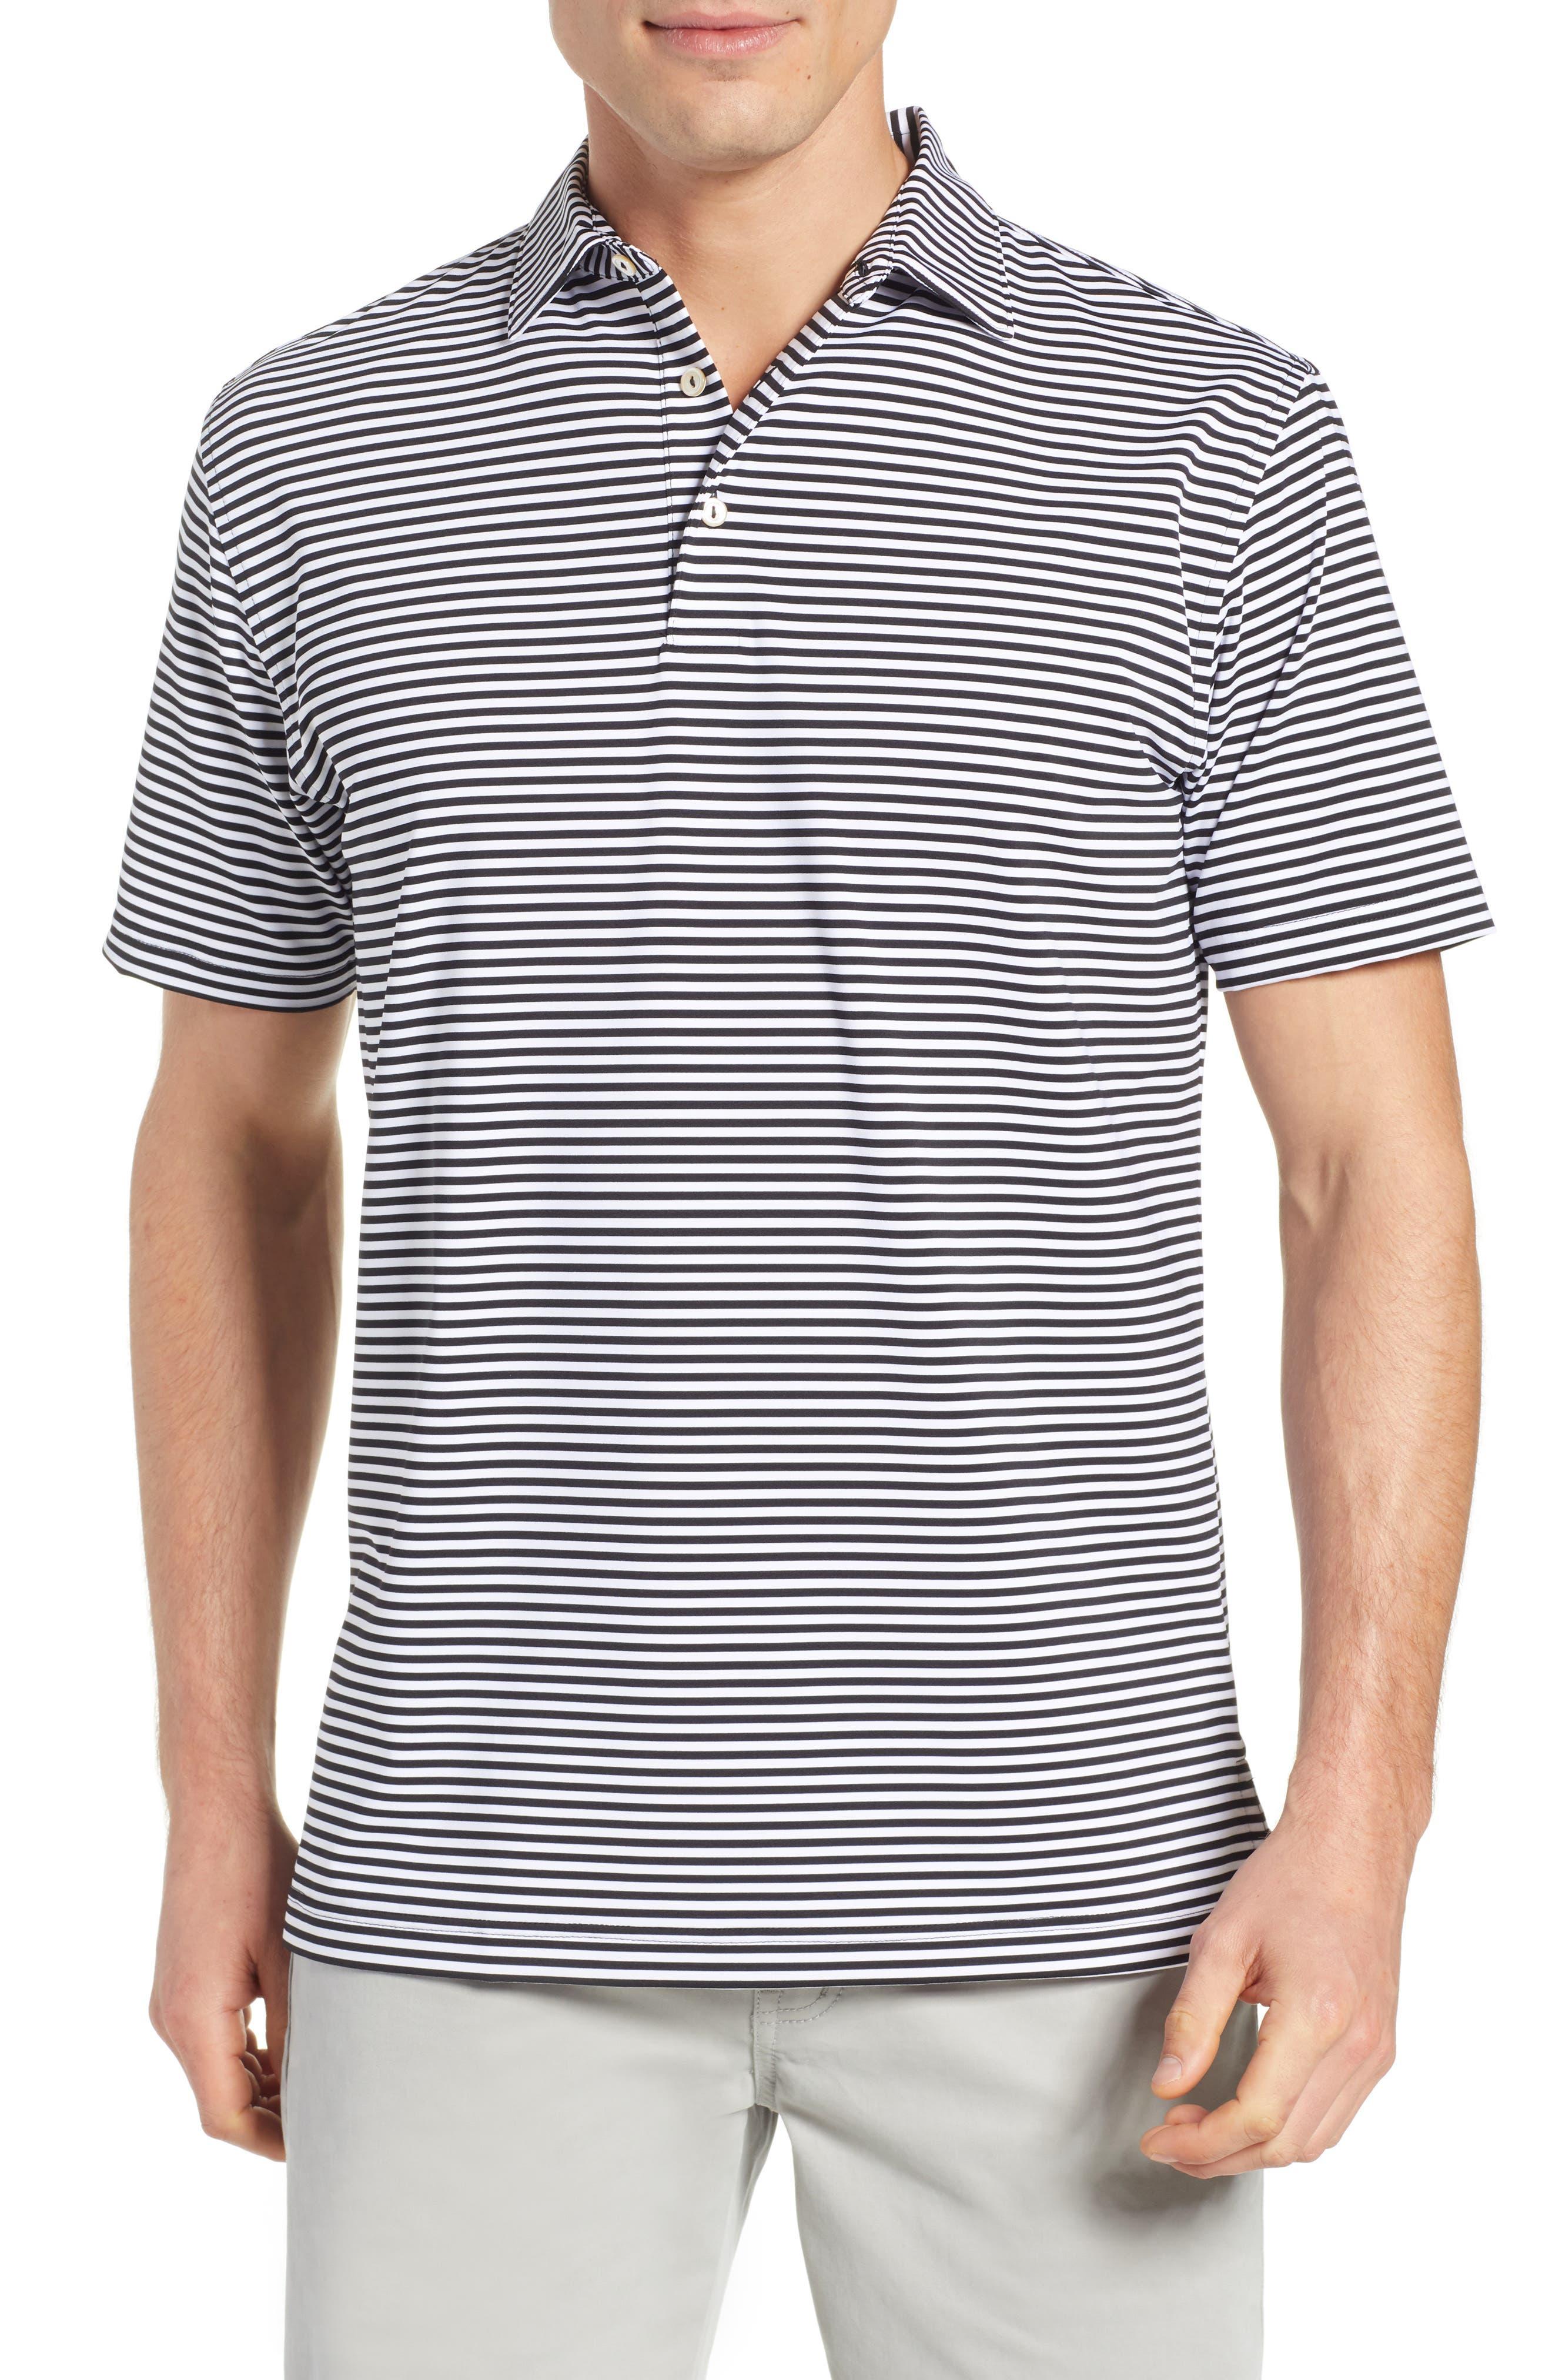 PETER MILLAR, Stripe Stretch Jersey Performance Polo, Main thumbnail 1, color, BLACK/WHITE